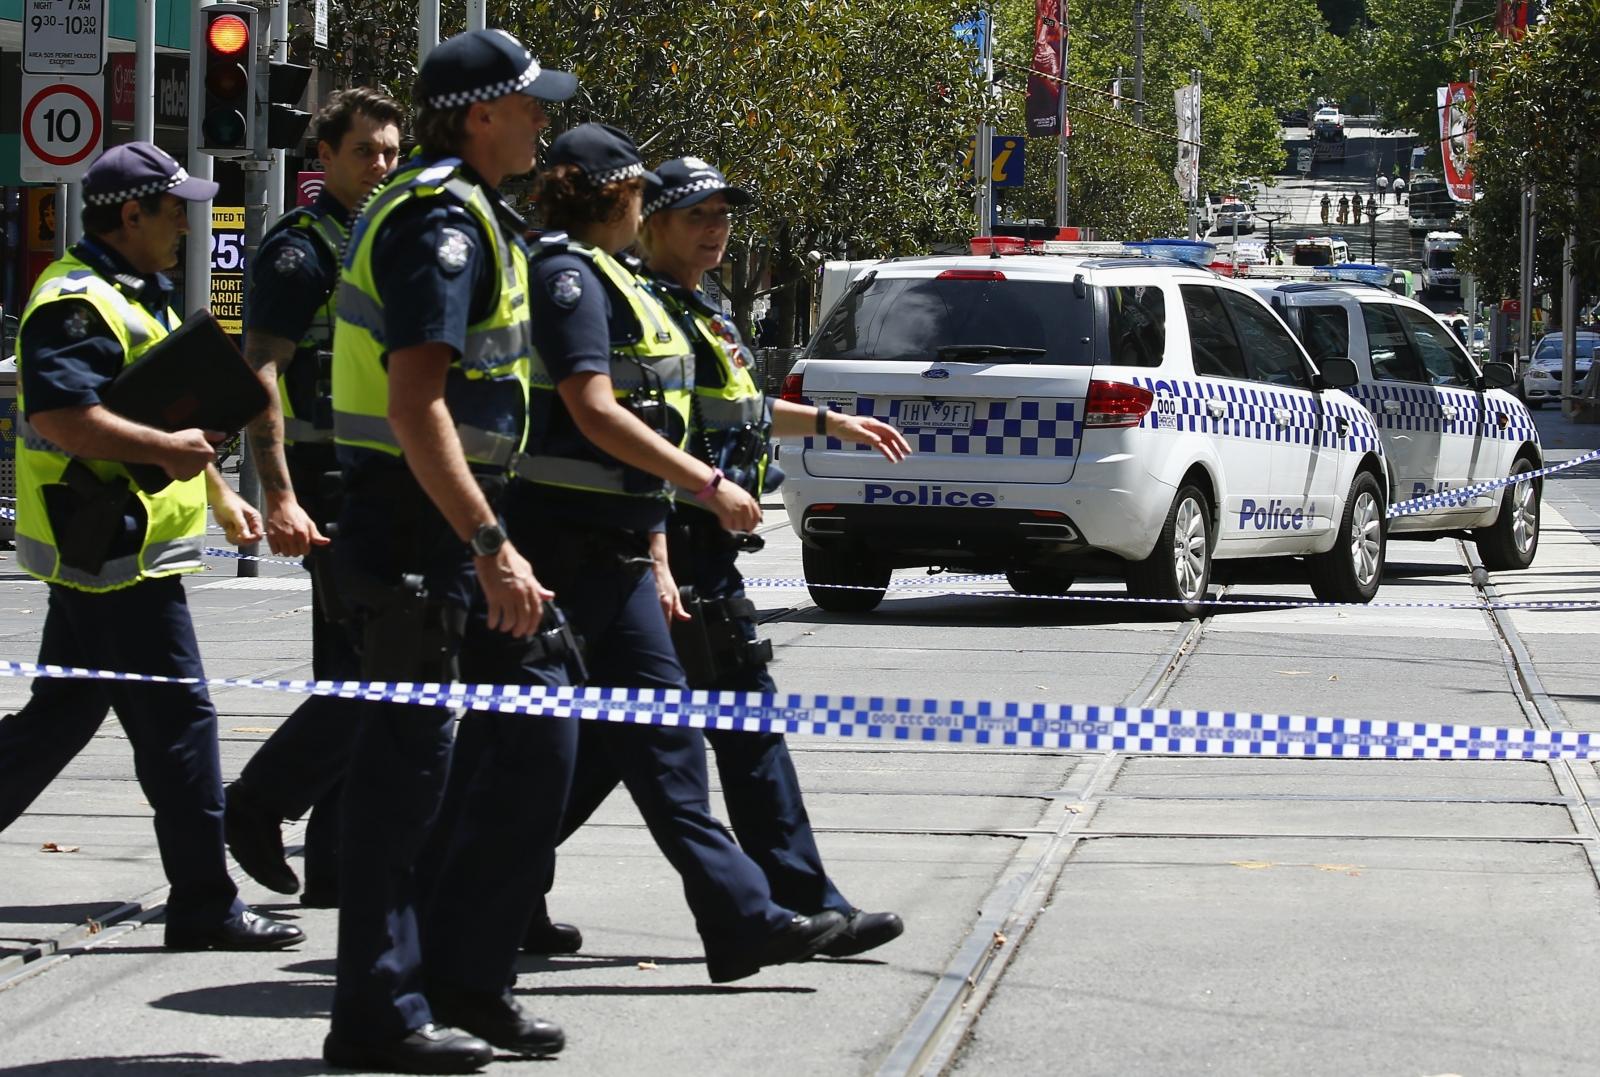 Police hunt armed man in Lockyer Valley